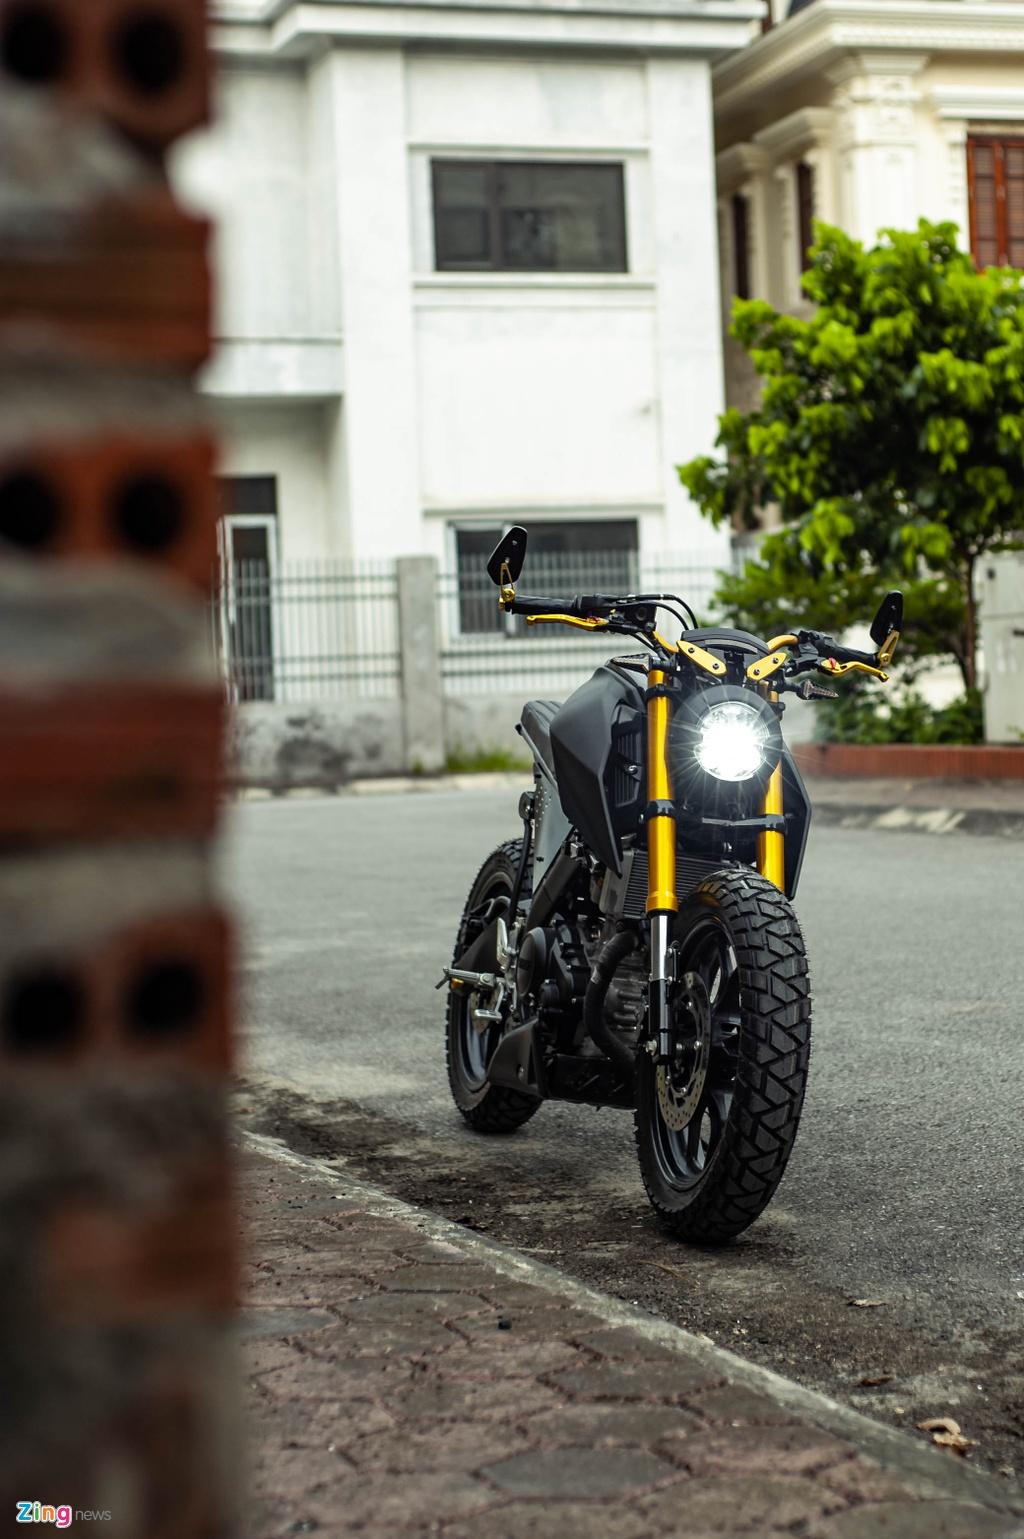 Yamaha TFX 150 lot xac hoan toan theo phong cach cafe racer tai Ha Noi hinh anh 9 TFX_do_zing_45_.jpg